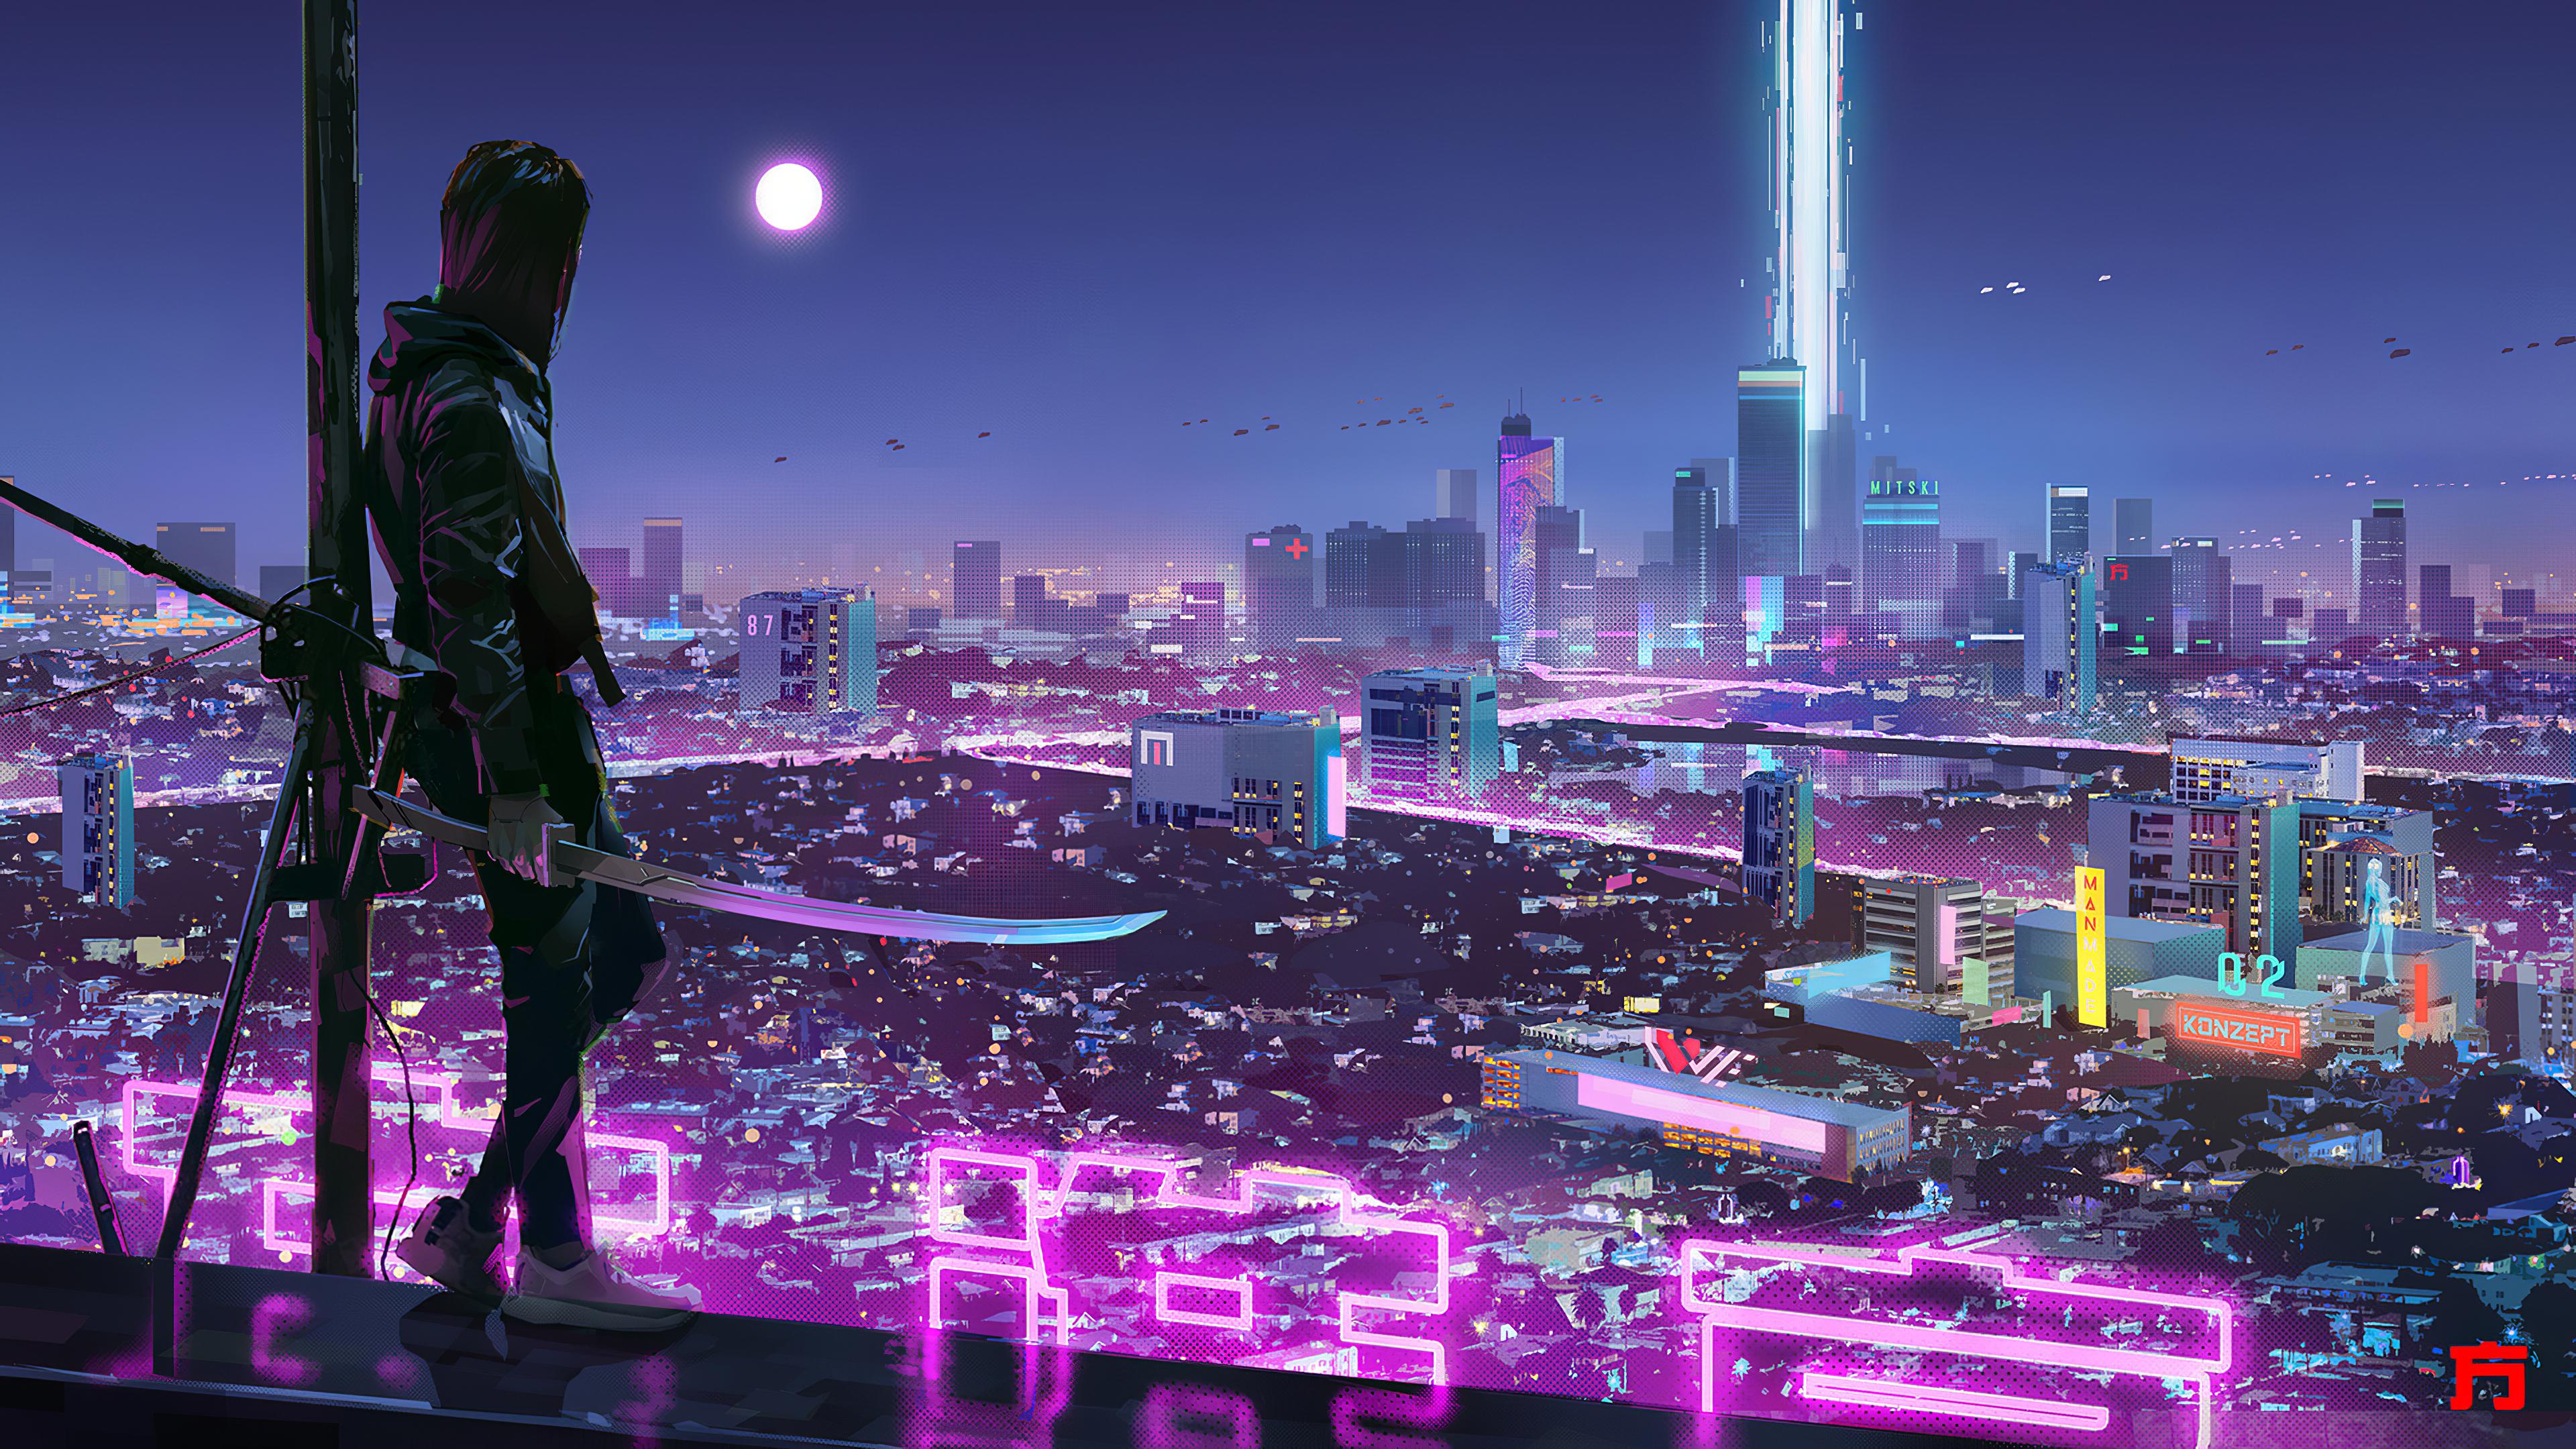 neon lights cyber ninja boy 1580055629 - Neon Lights Cyber Ninja Boy -